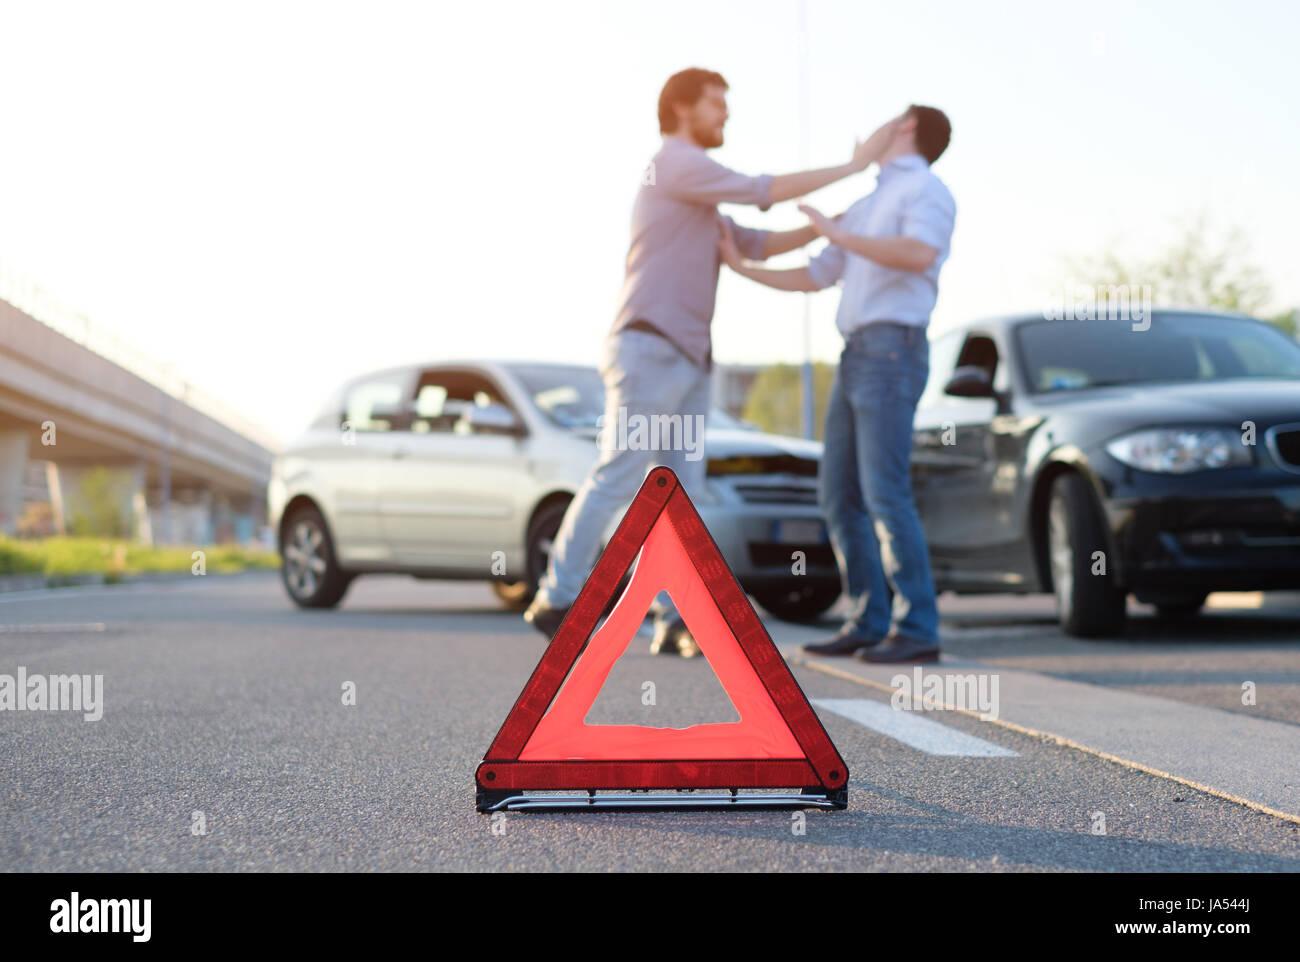 Two angry men arguing after a car fender-bender crash - Stock Image